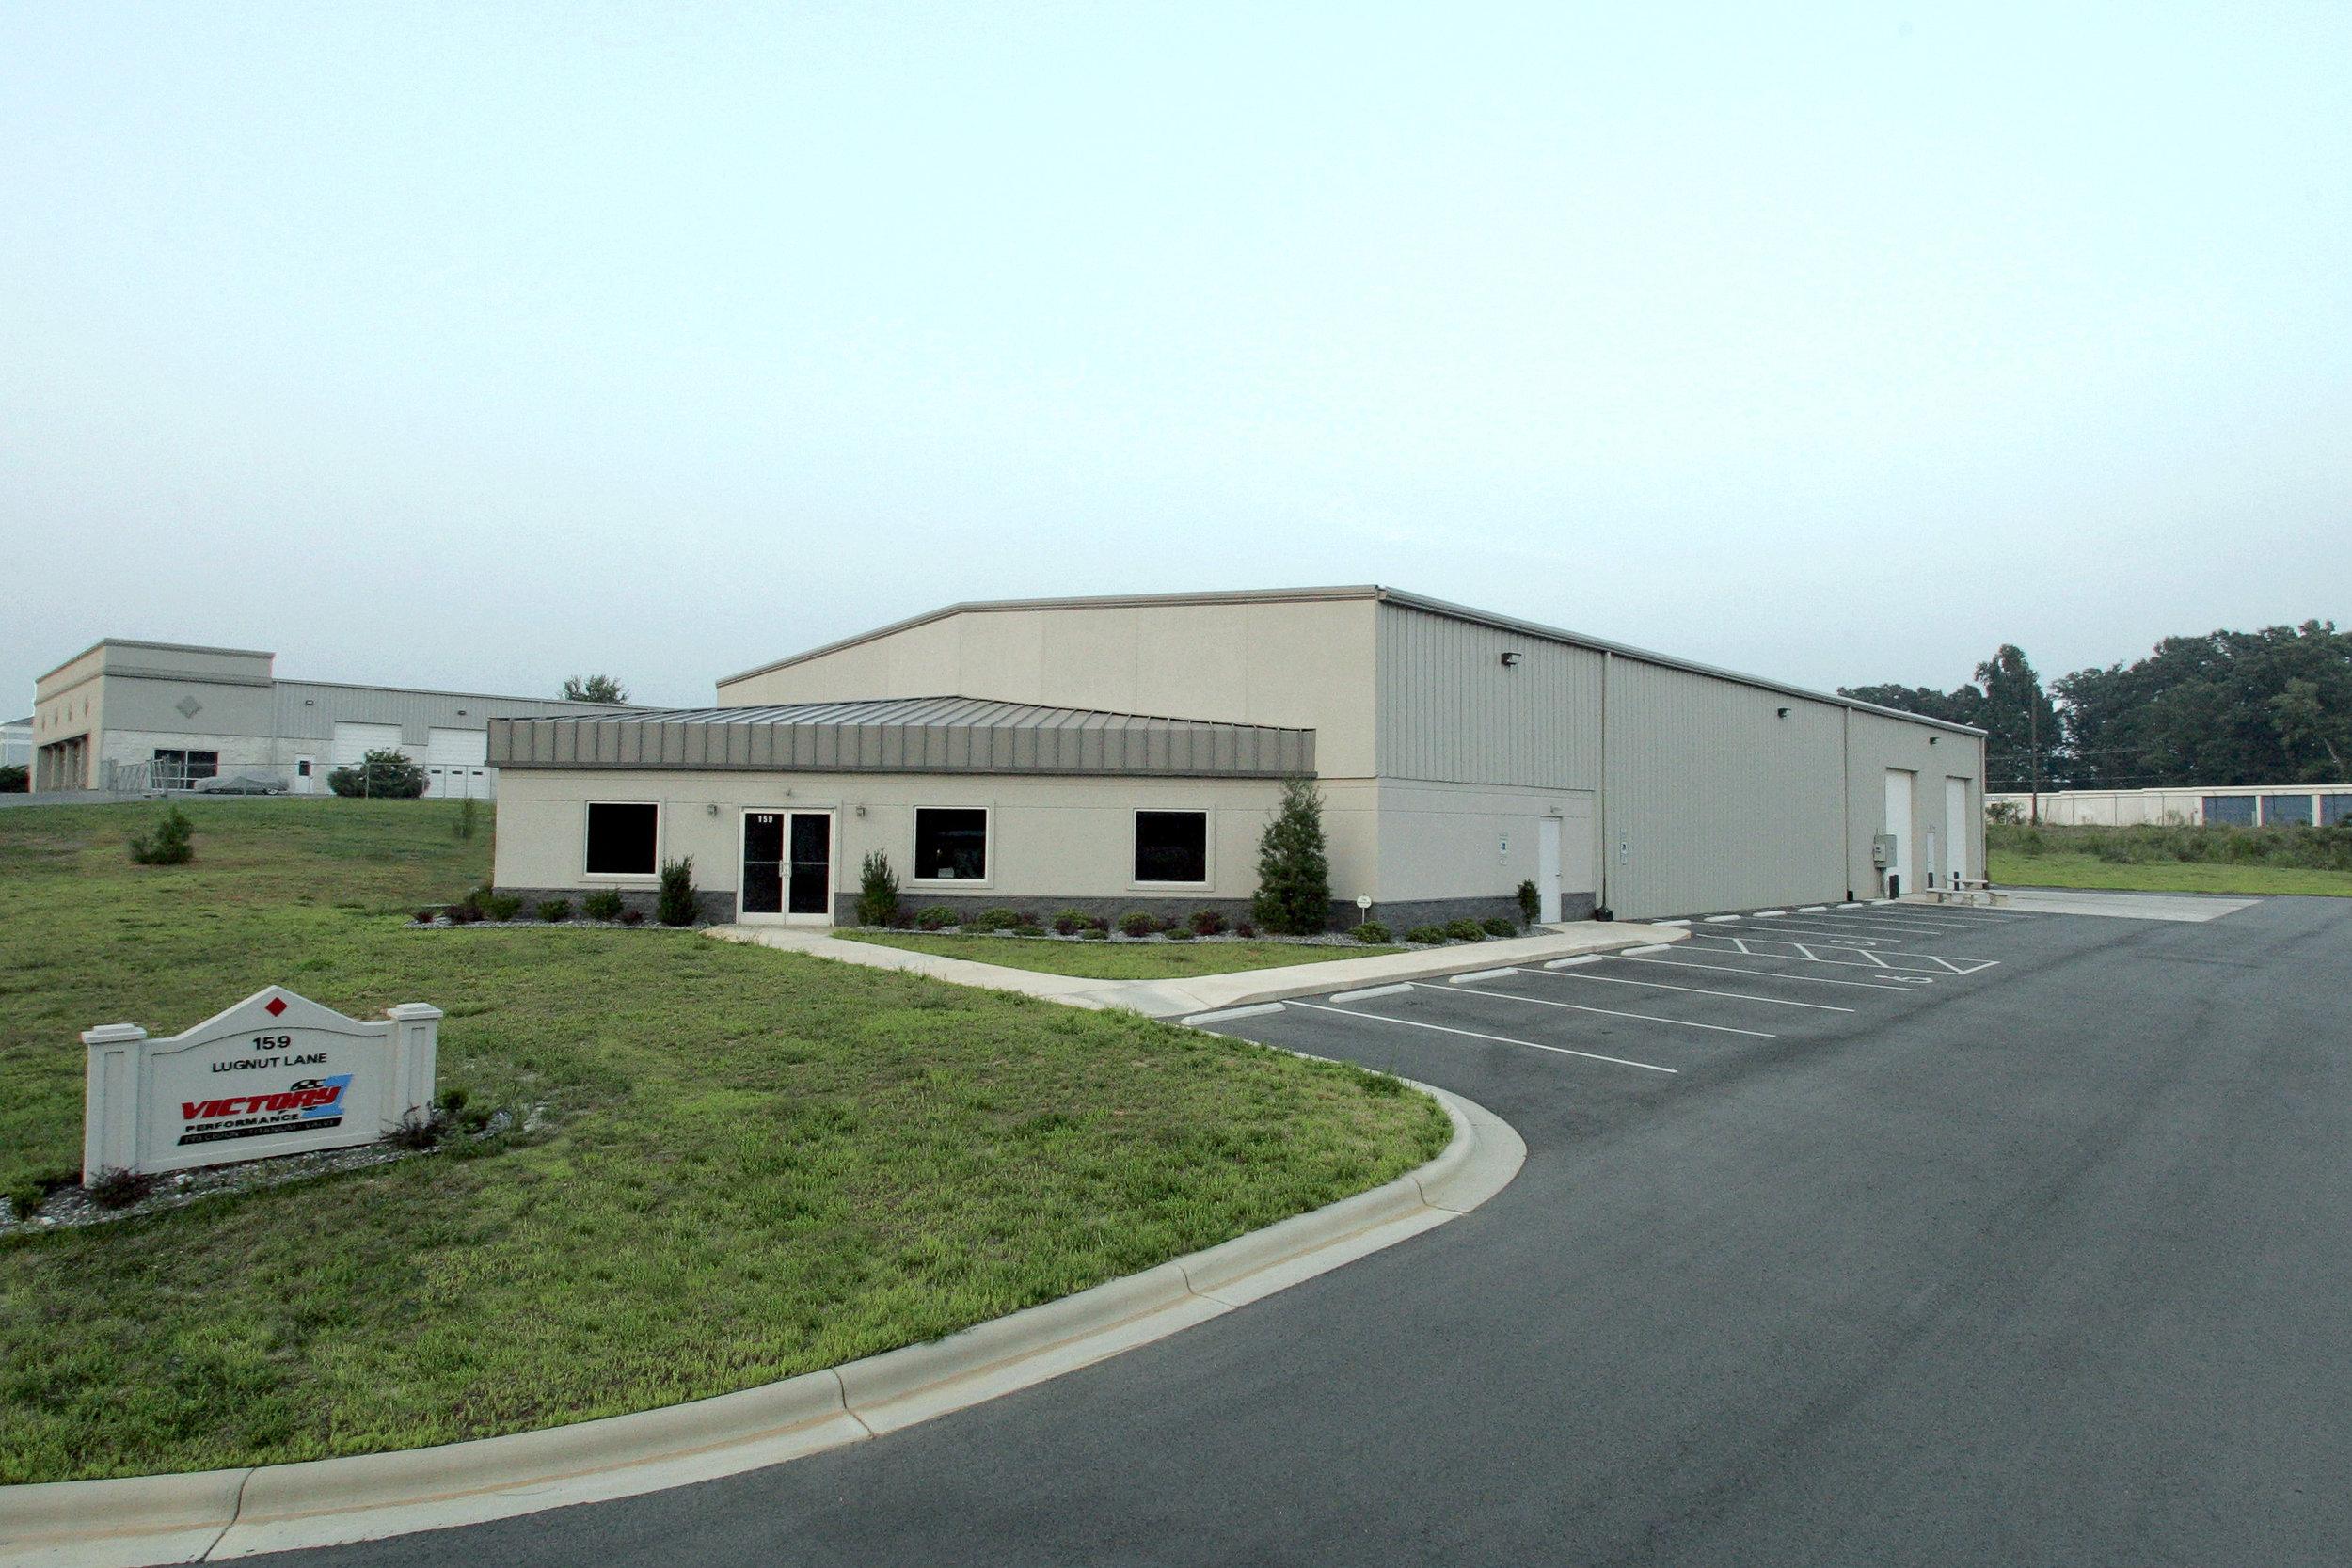 Victory World Headquarters in Mooresville, North Carolina USA